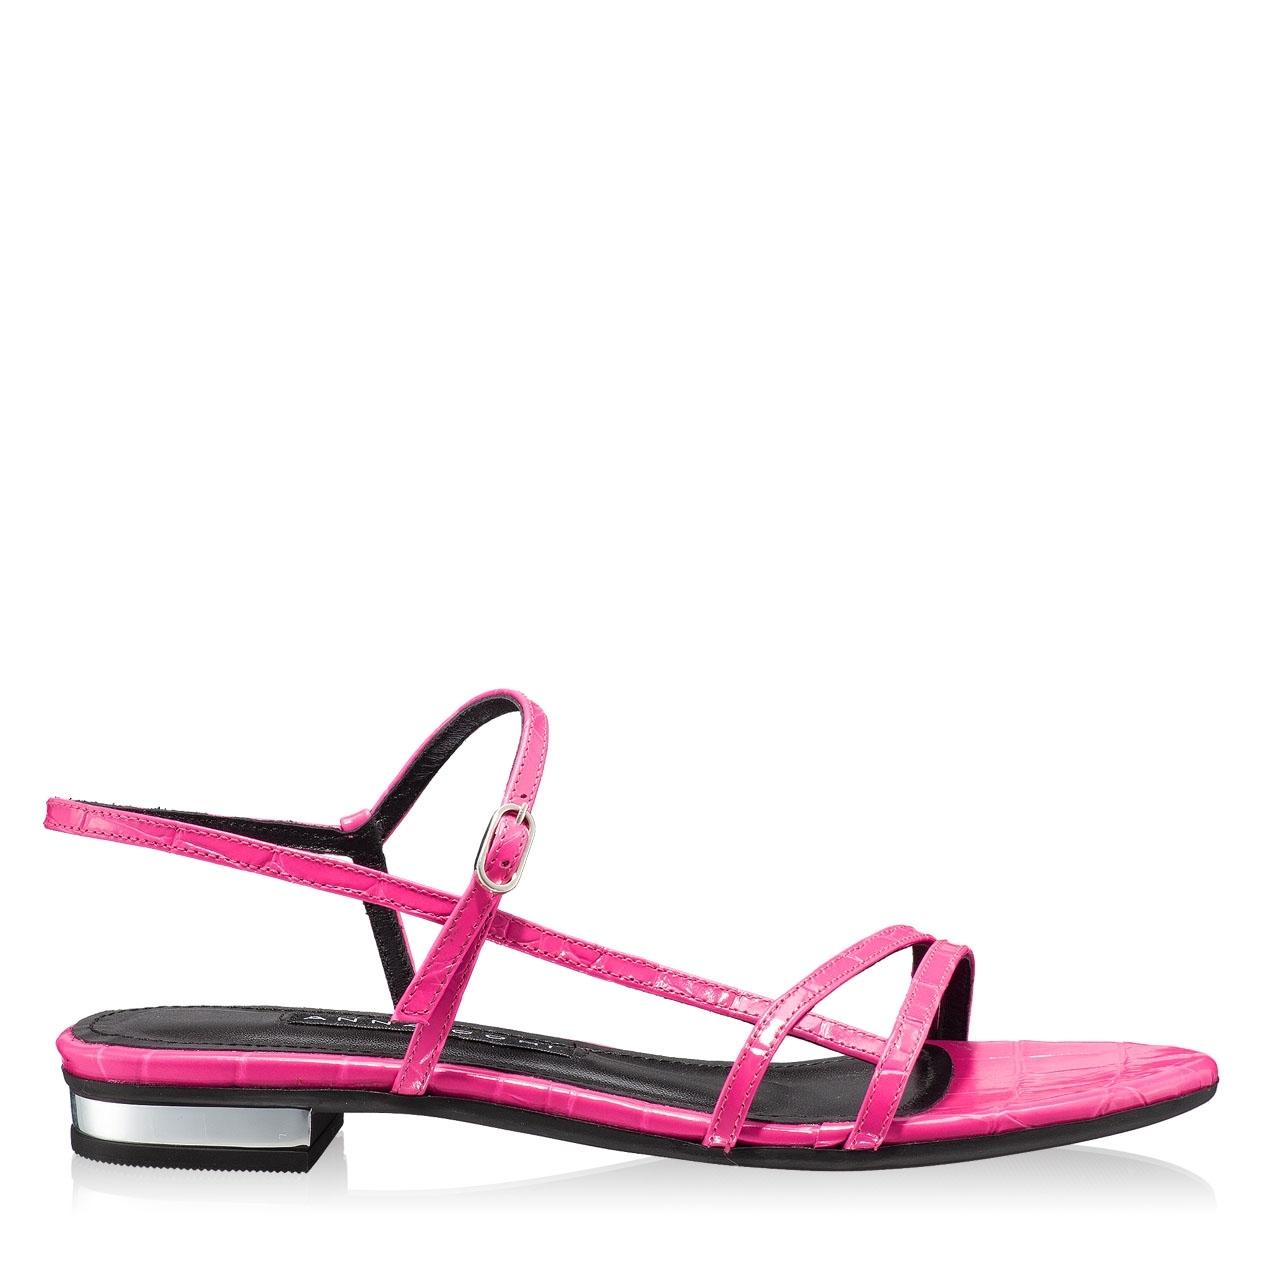 Imagine Sandale Dama 5850 Croco Fuxia